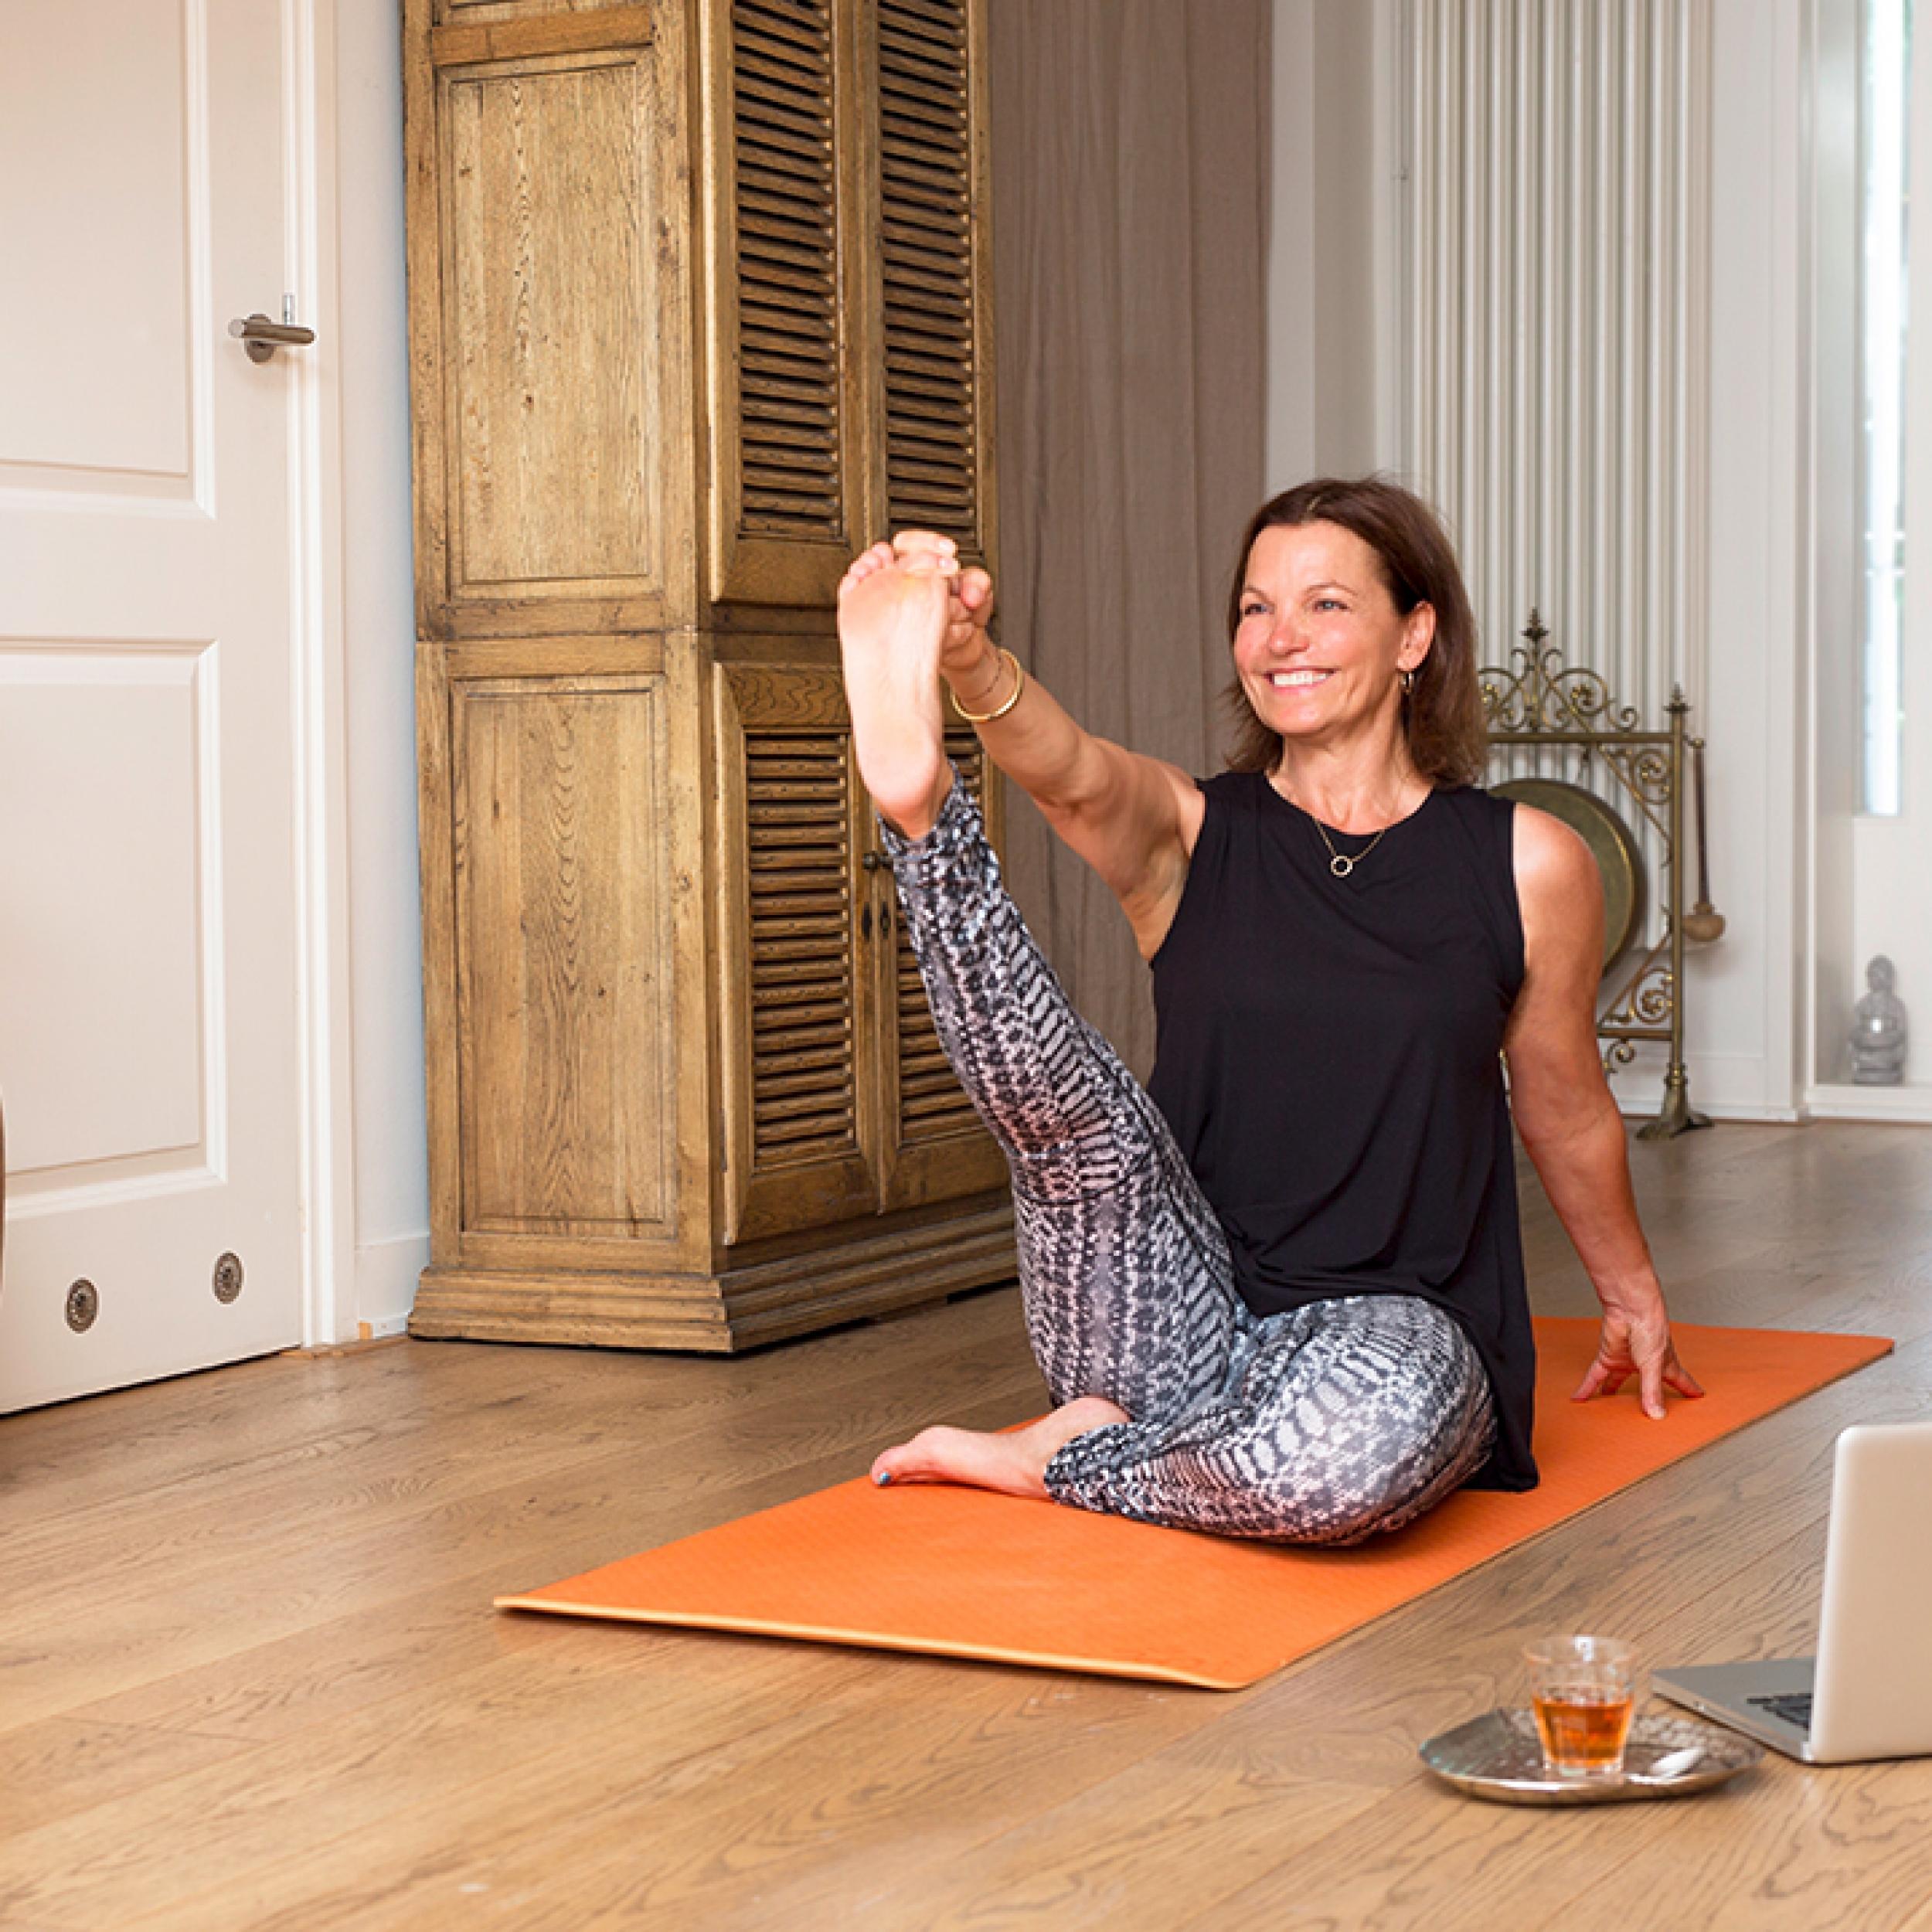 30 Mornings of Yoga